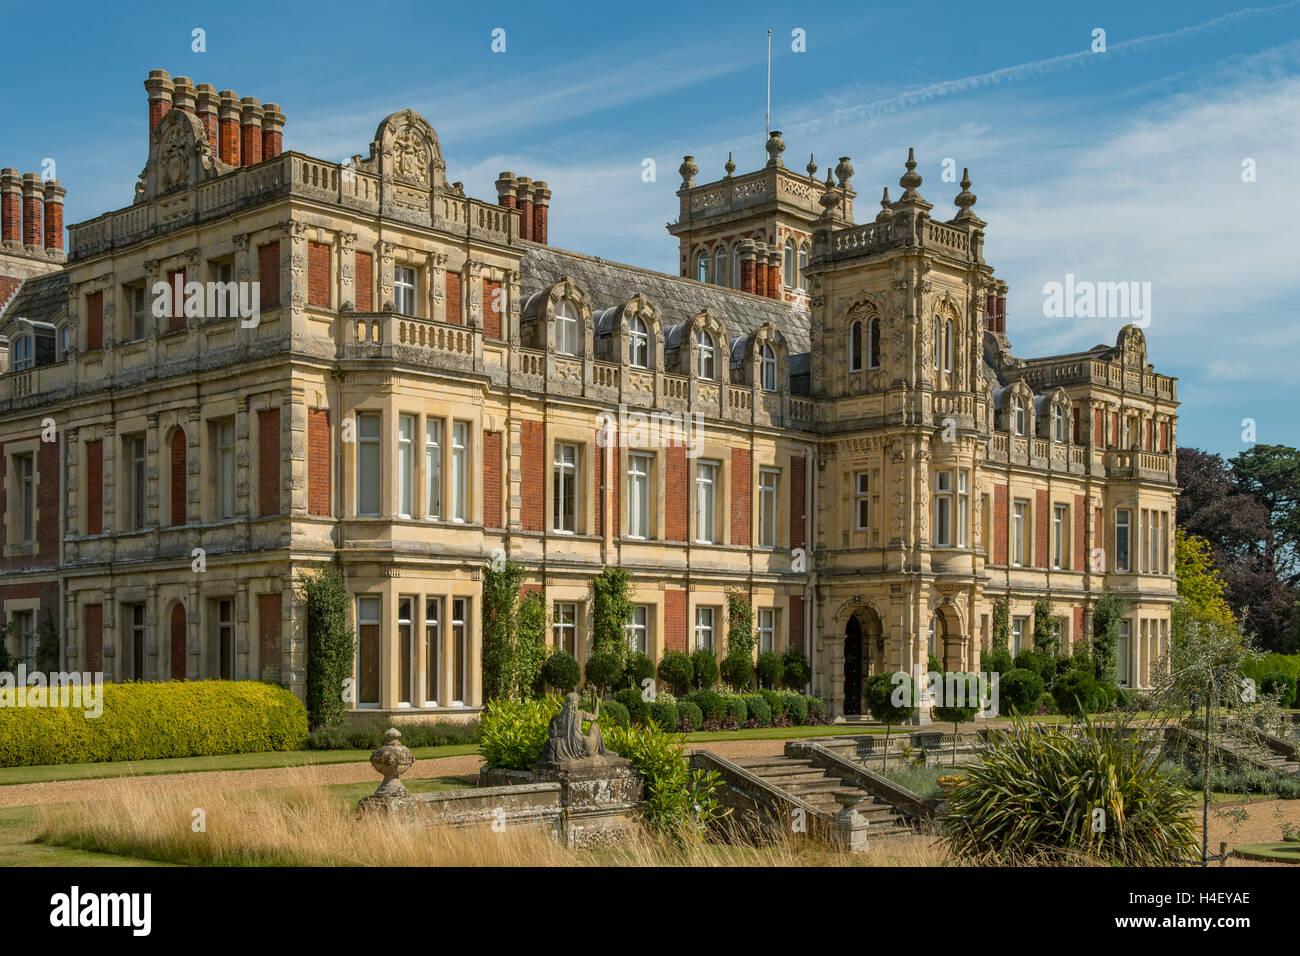 Somerleyton Hall Gardens Norfolk England Stock Photos & Somerleyton ...